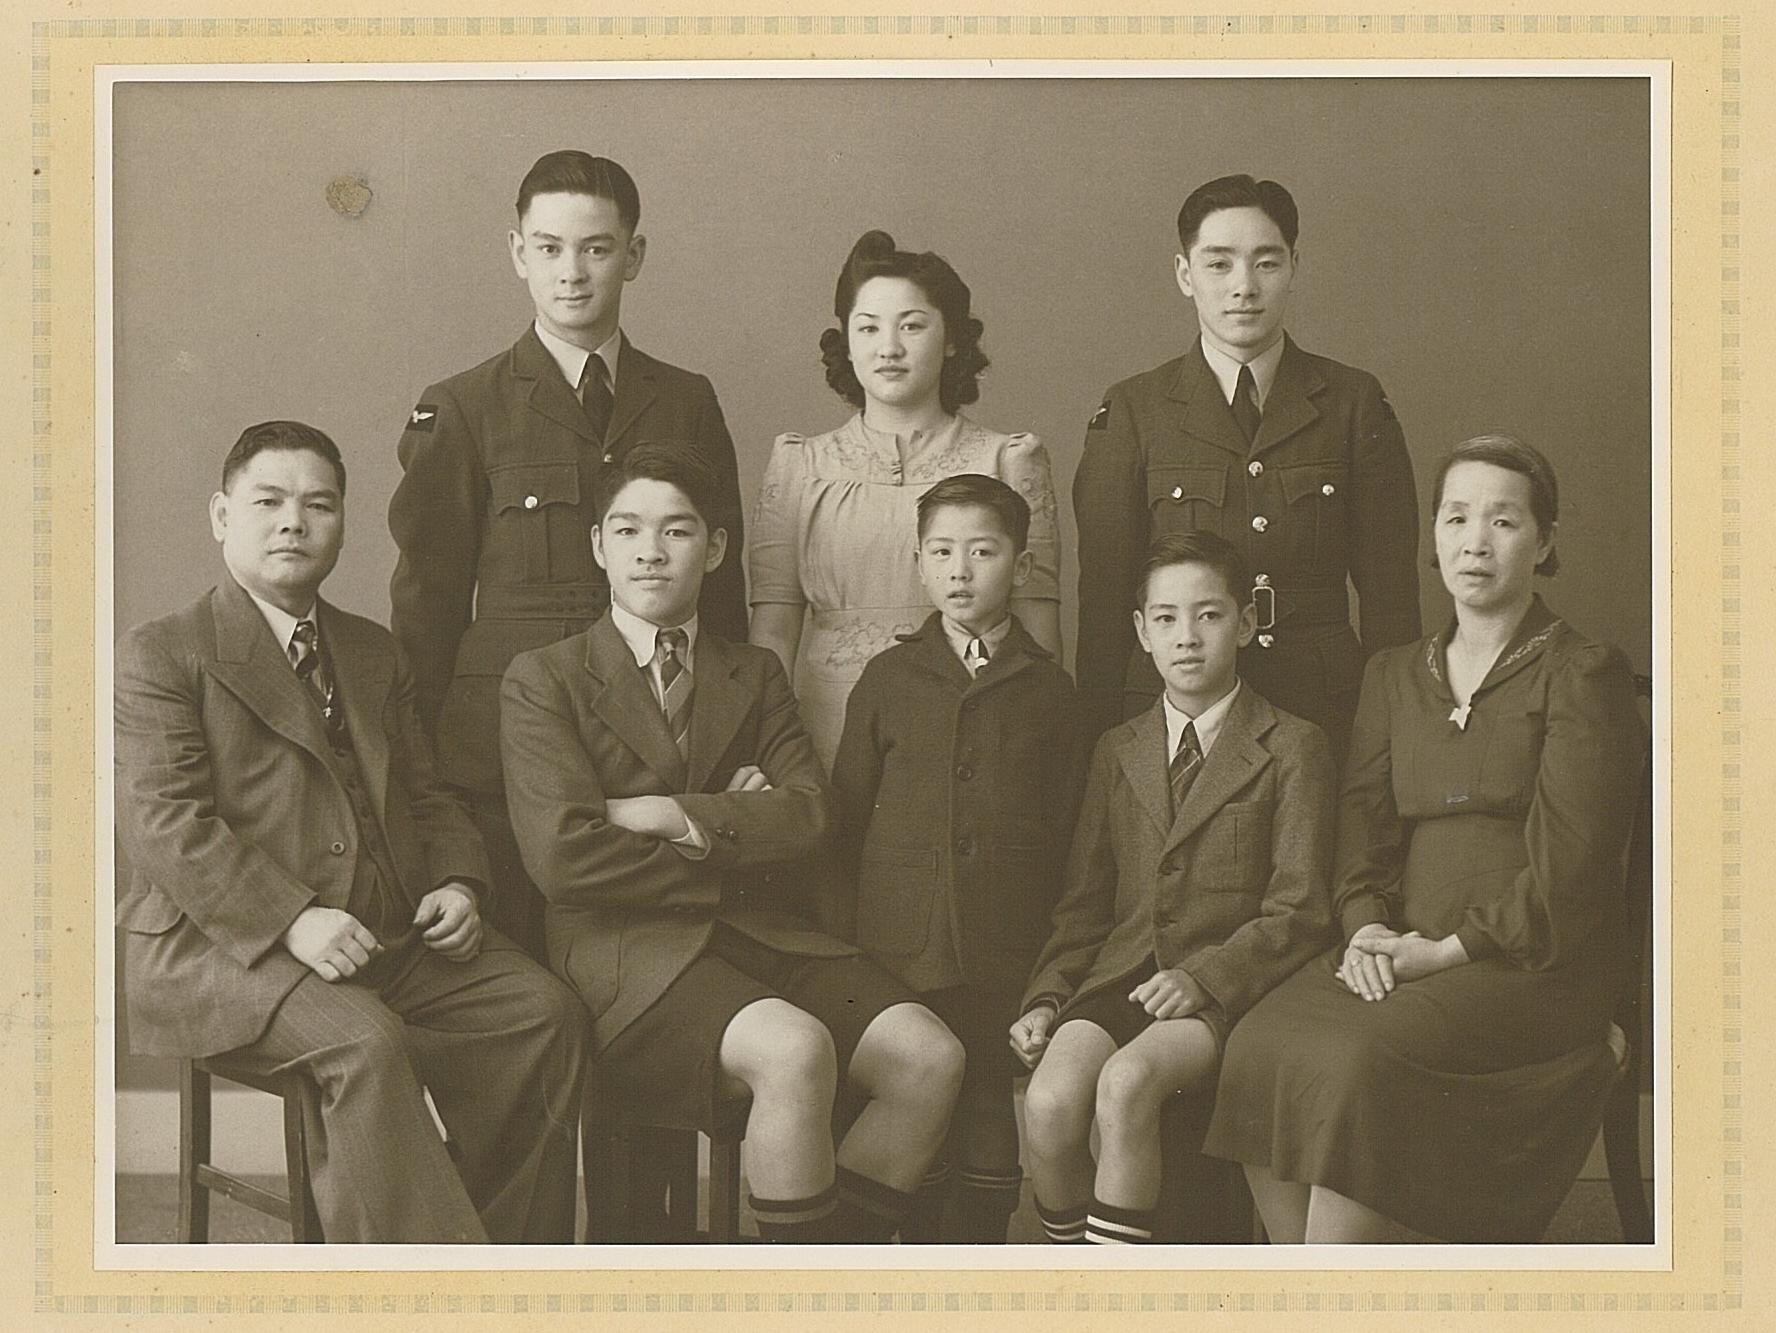 Leong Family Kete Hamilton.png